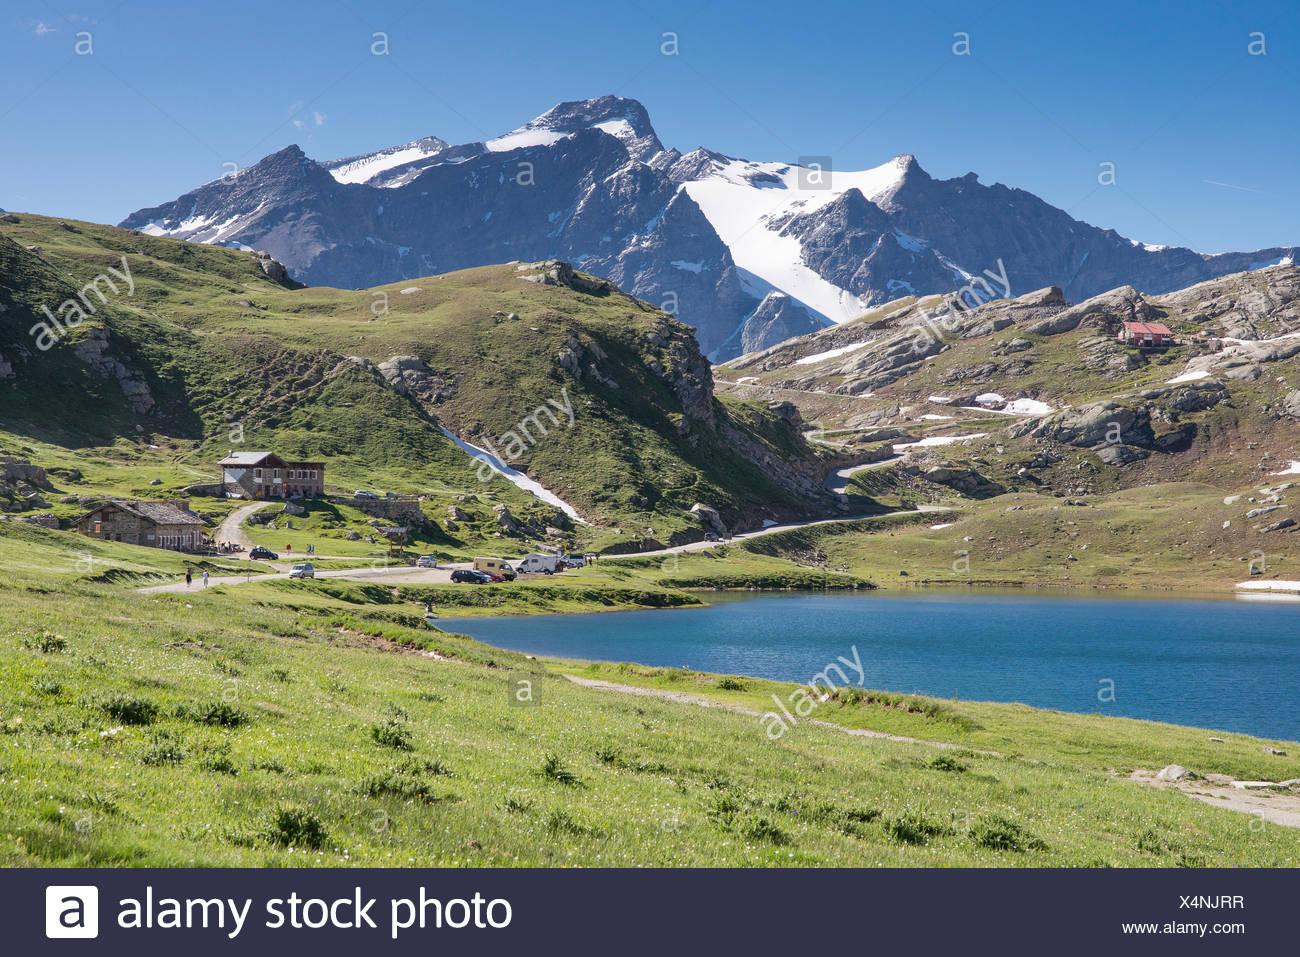 Plateau with mountain hut Rifugio Savoia, pass road Colle del Nivolet, National Park Gran Paradiso, Ceresole realale, Piedmont Stock Photo